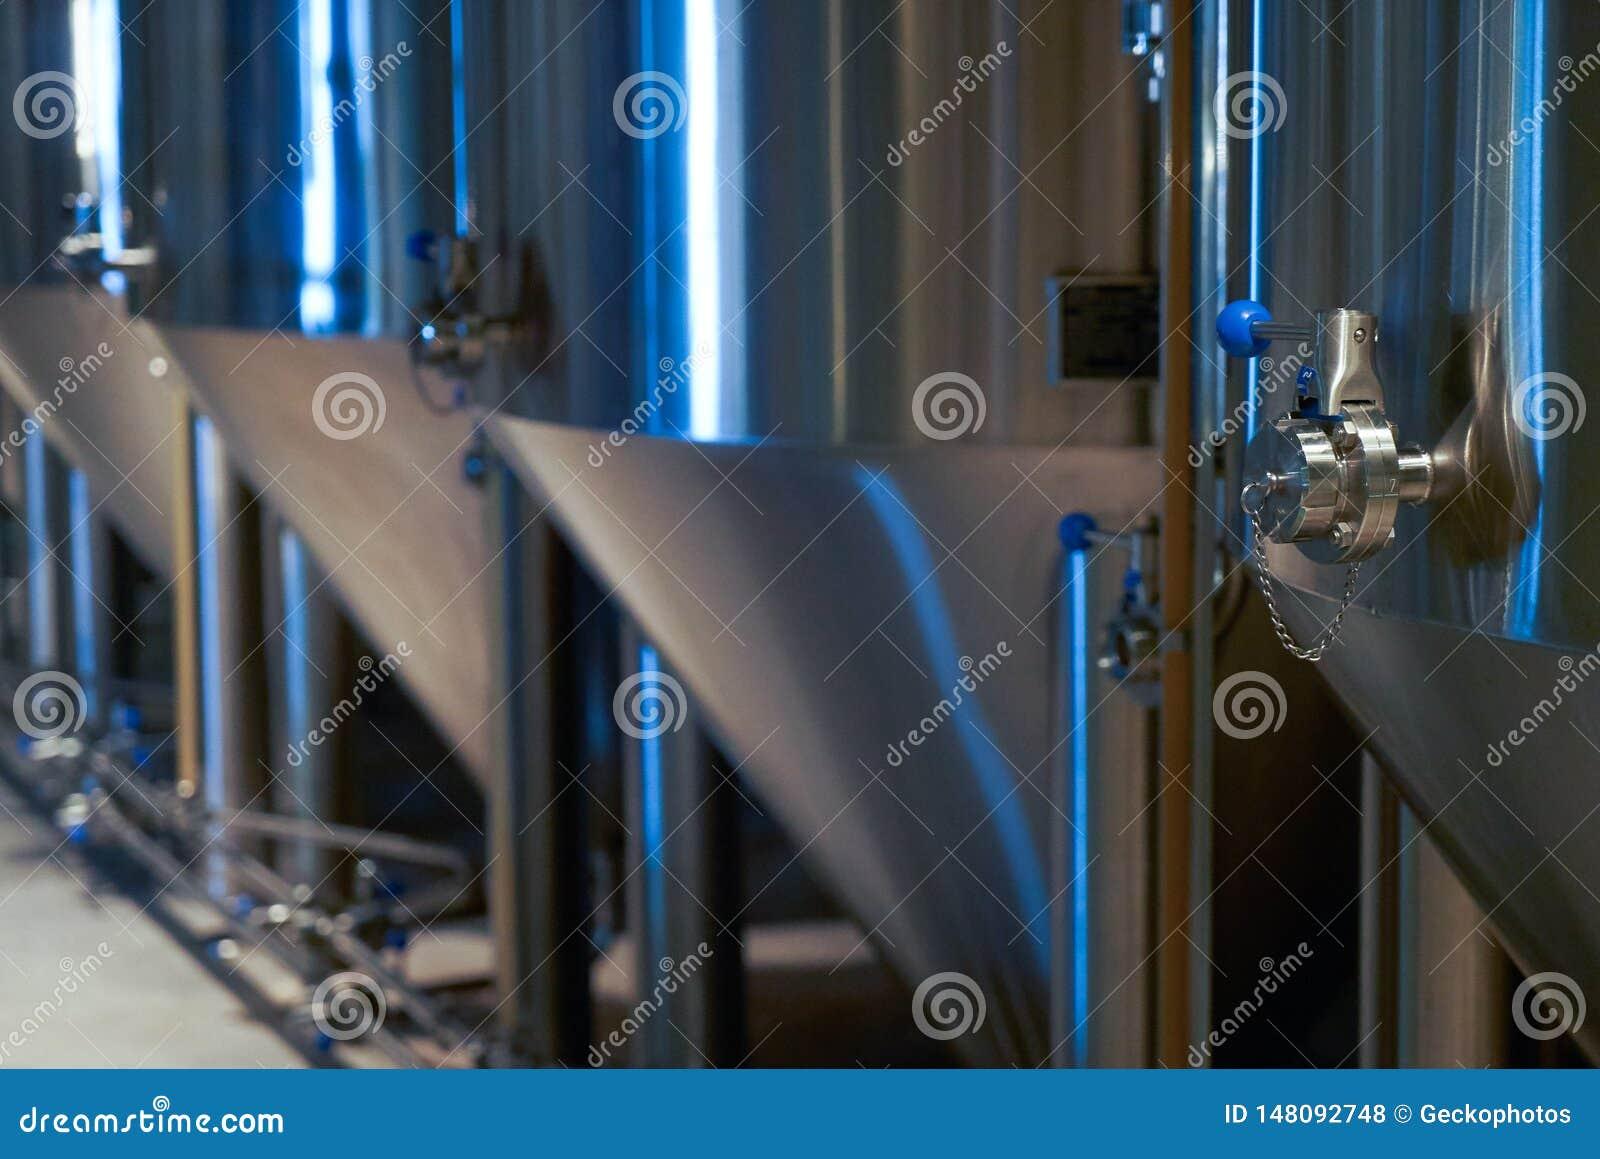 Hantverk?lproduktion i privat bryggeri, n?rbild